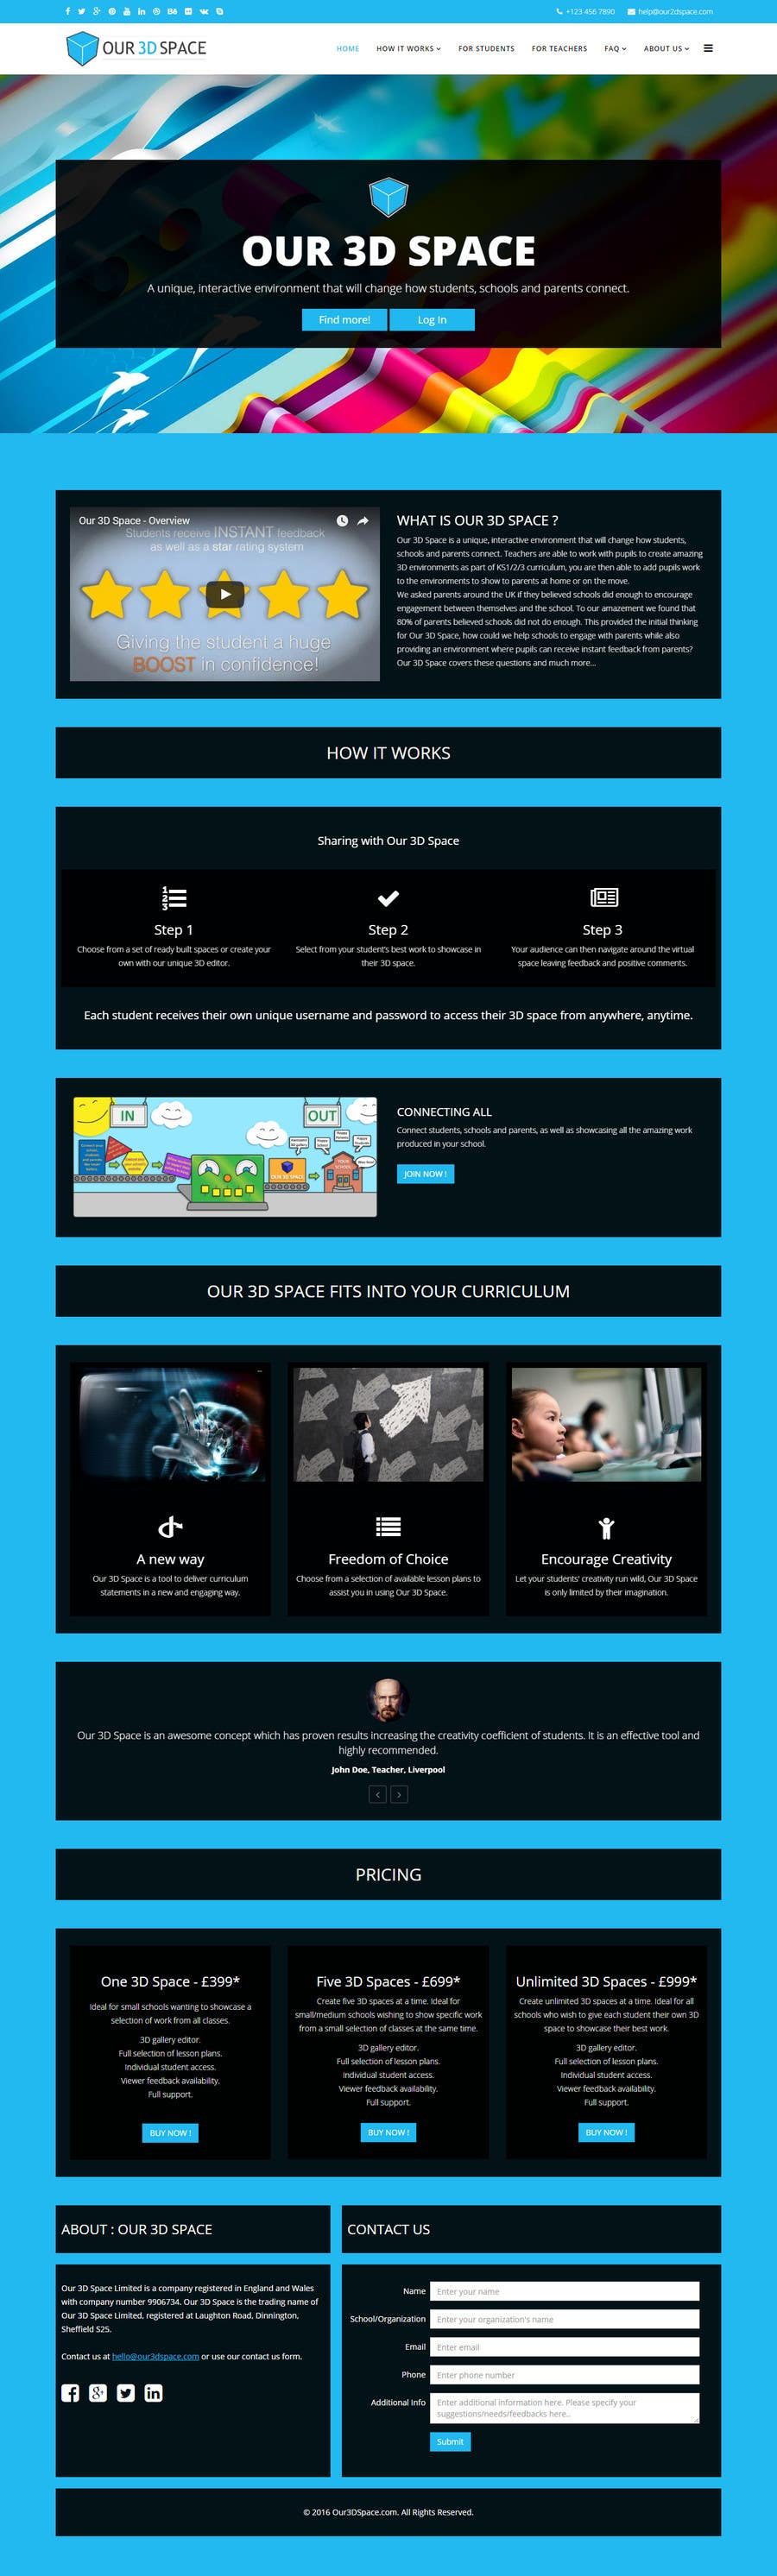 Kilpailutyö #20 kilpailussa Design a Website Mockup for an existing site